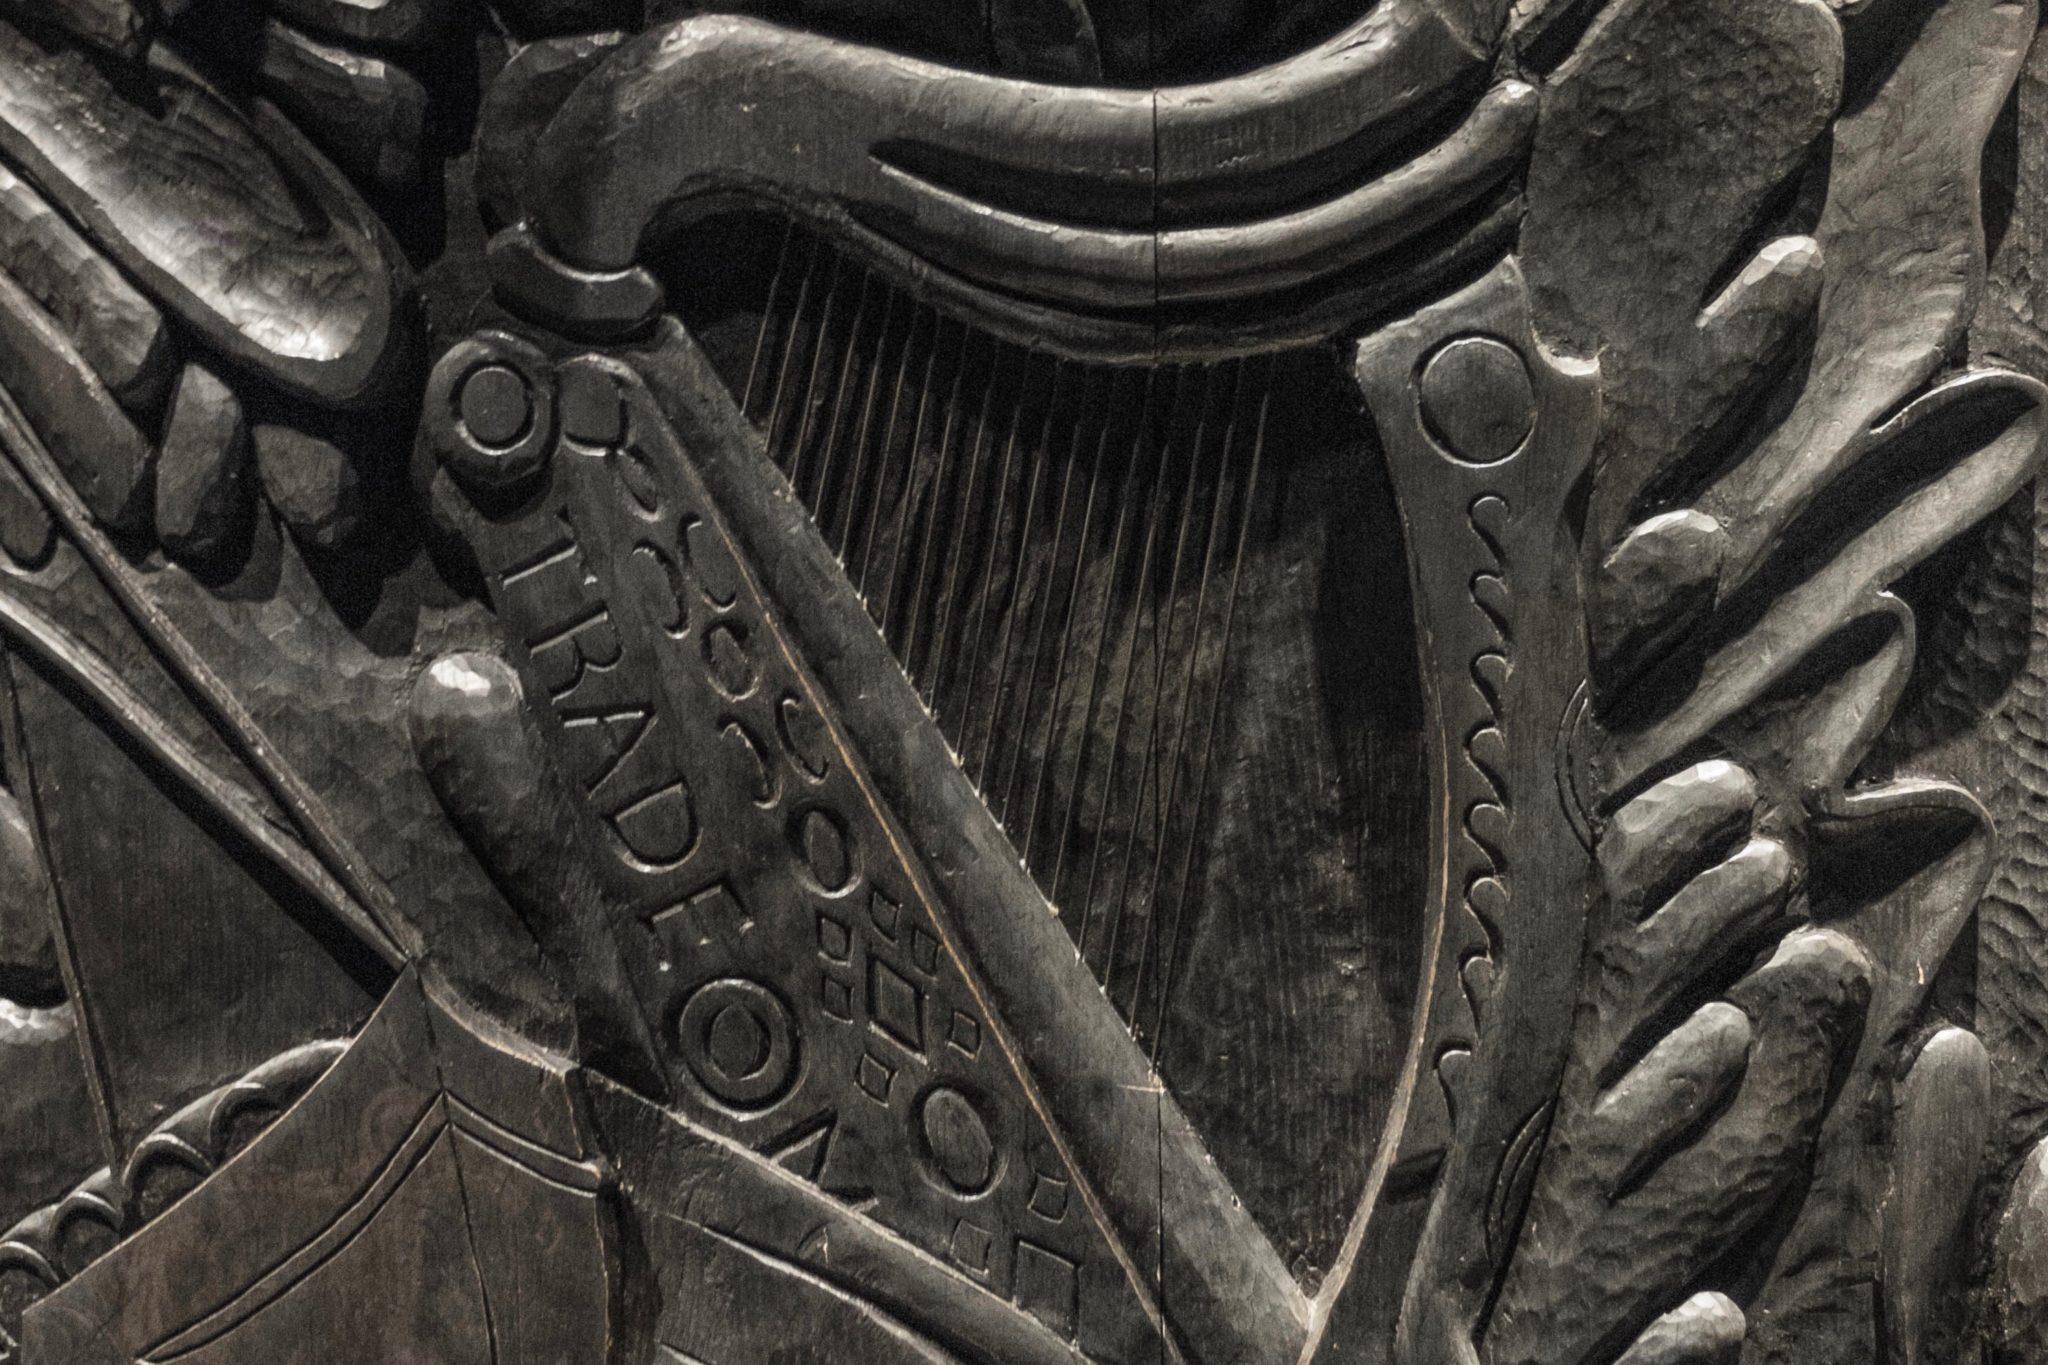 St. Patrick's Day in Dublin: Dem Klang der Harfe nach